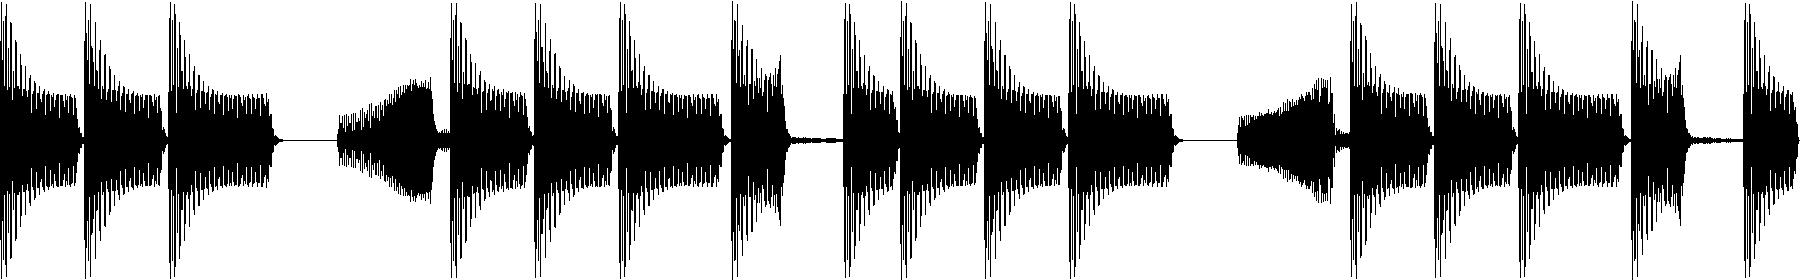 vedh melodyloop 040 g 120bpm